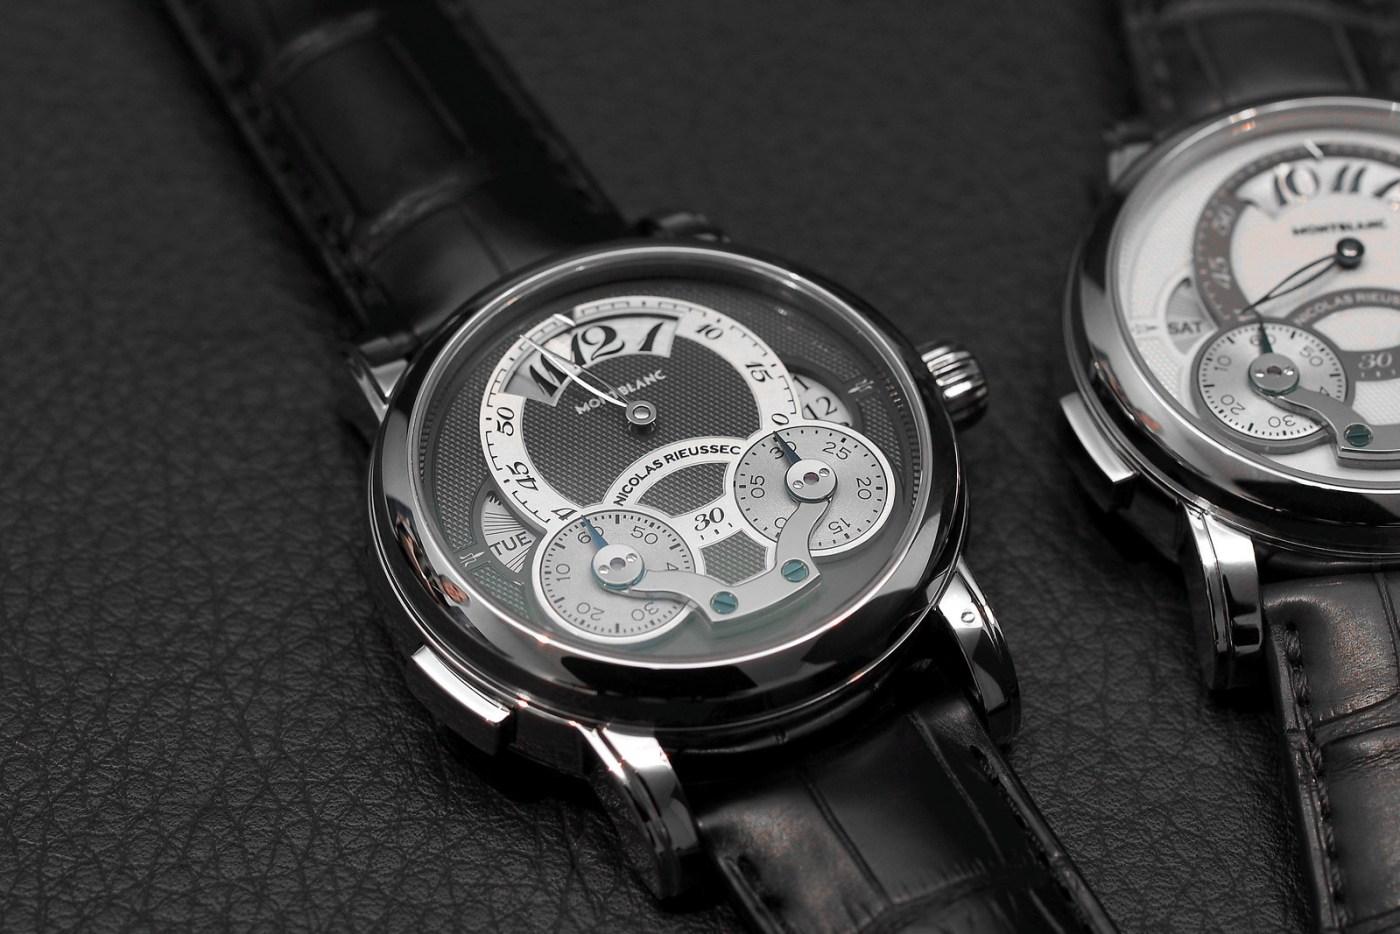 Montblanc Nicolas Rieussec Rising Hours Chronograph